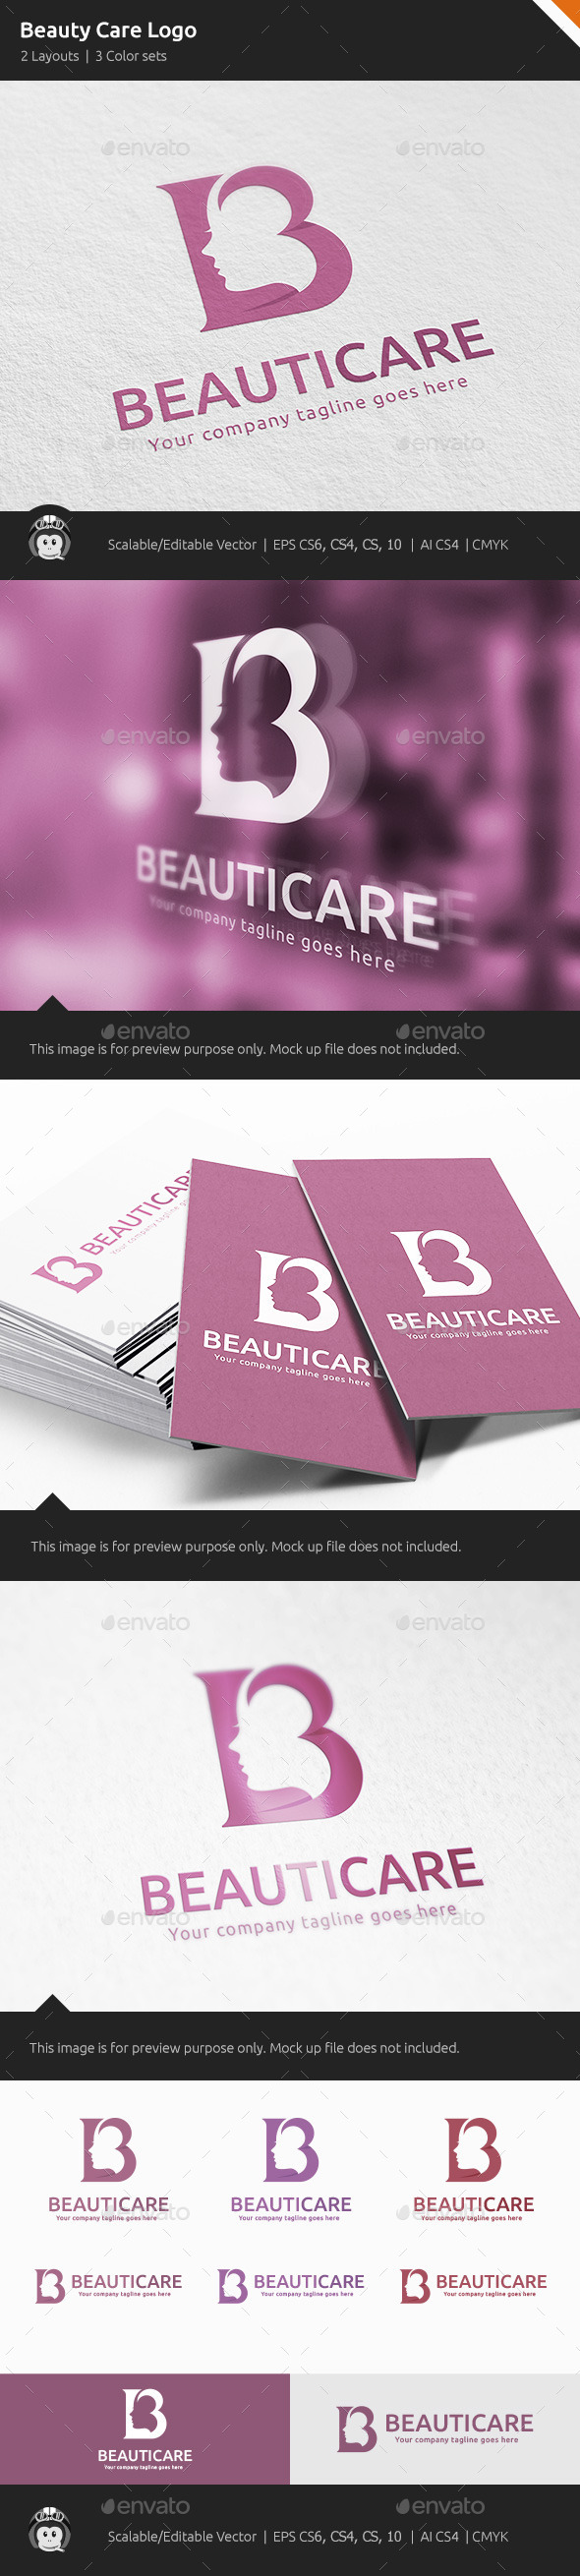 GraphicRiver Beauty Care Woman Logo 10559412